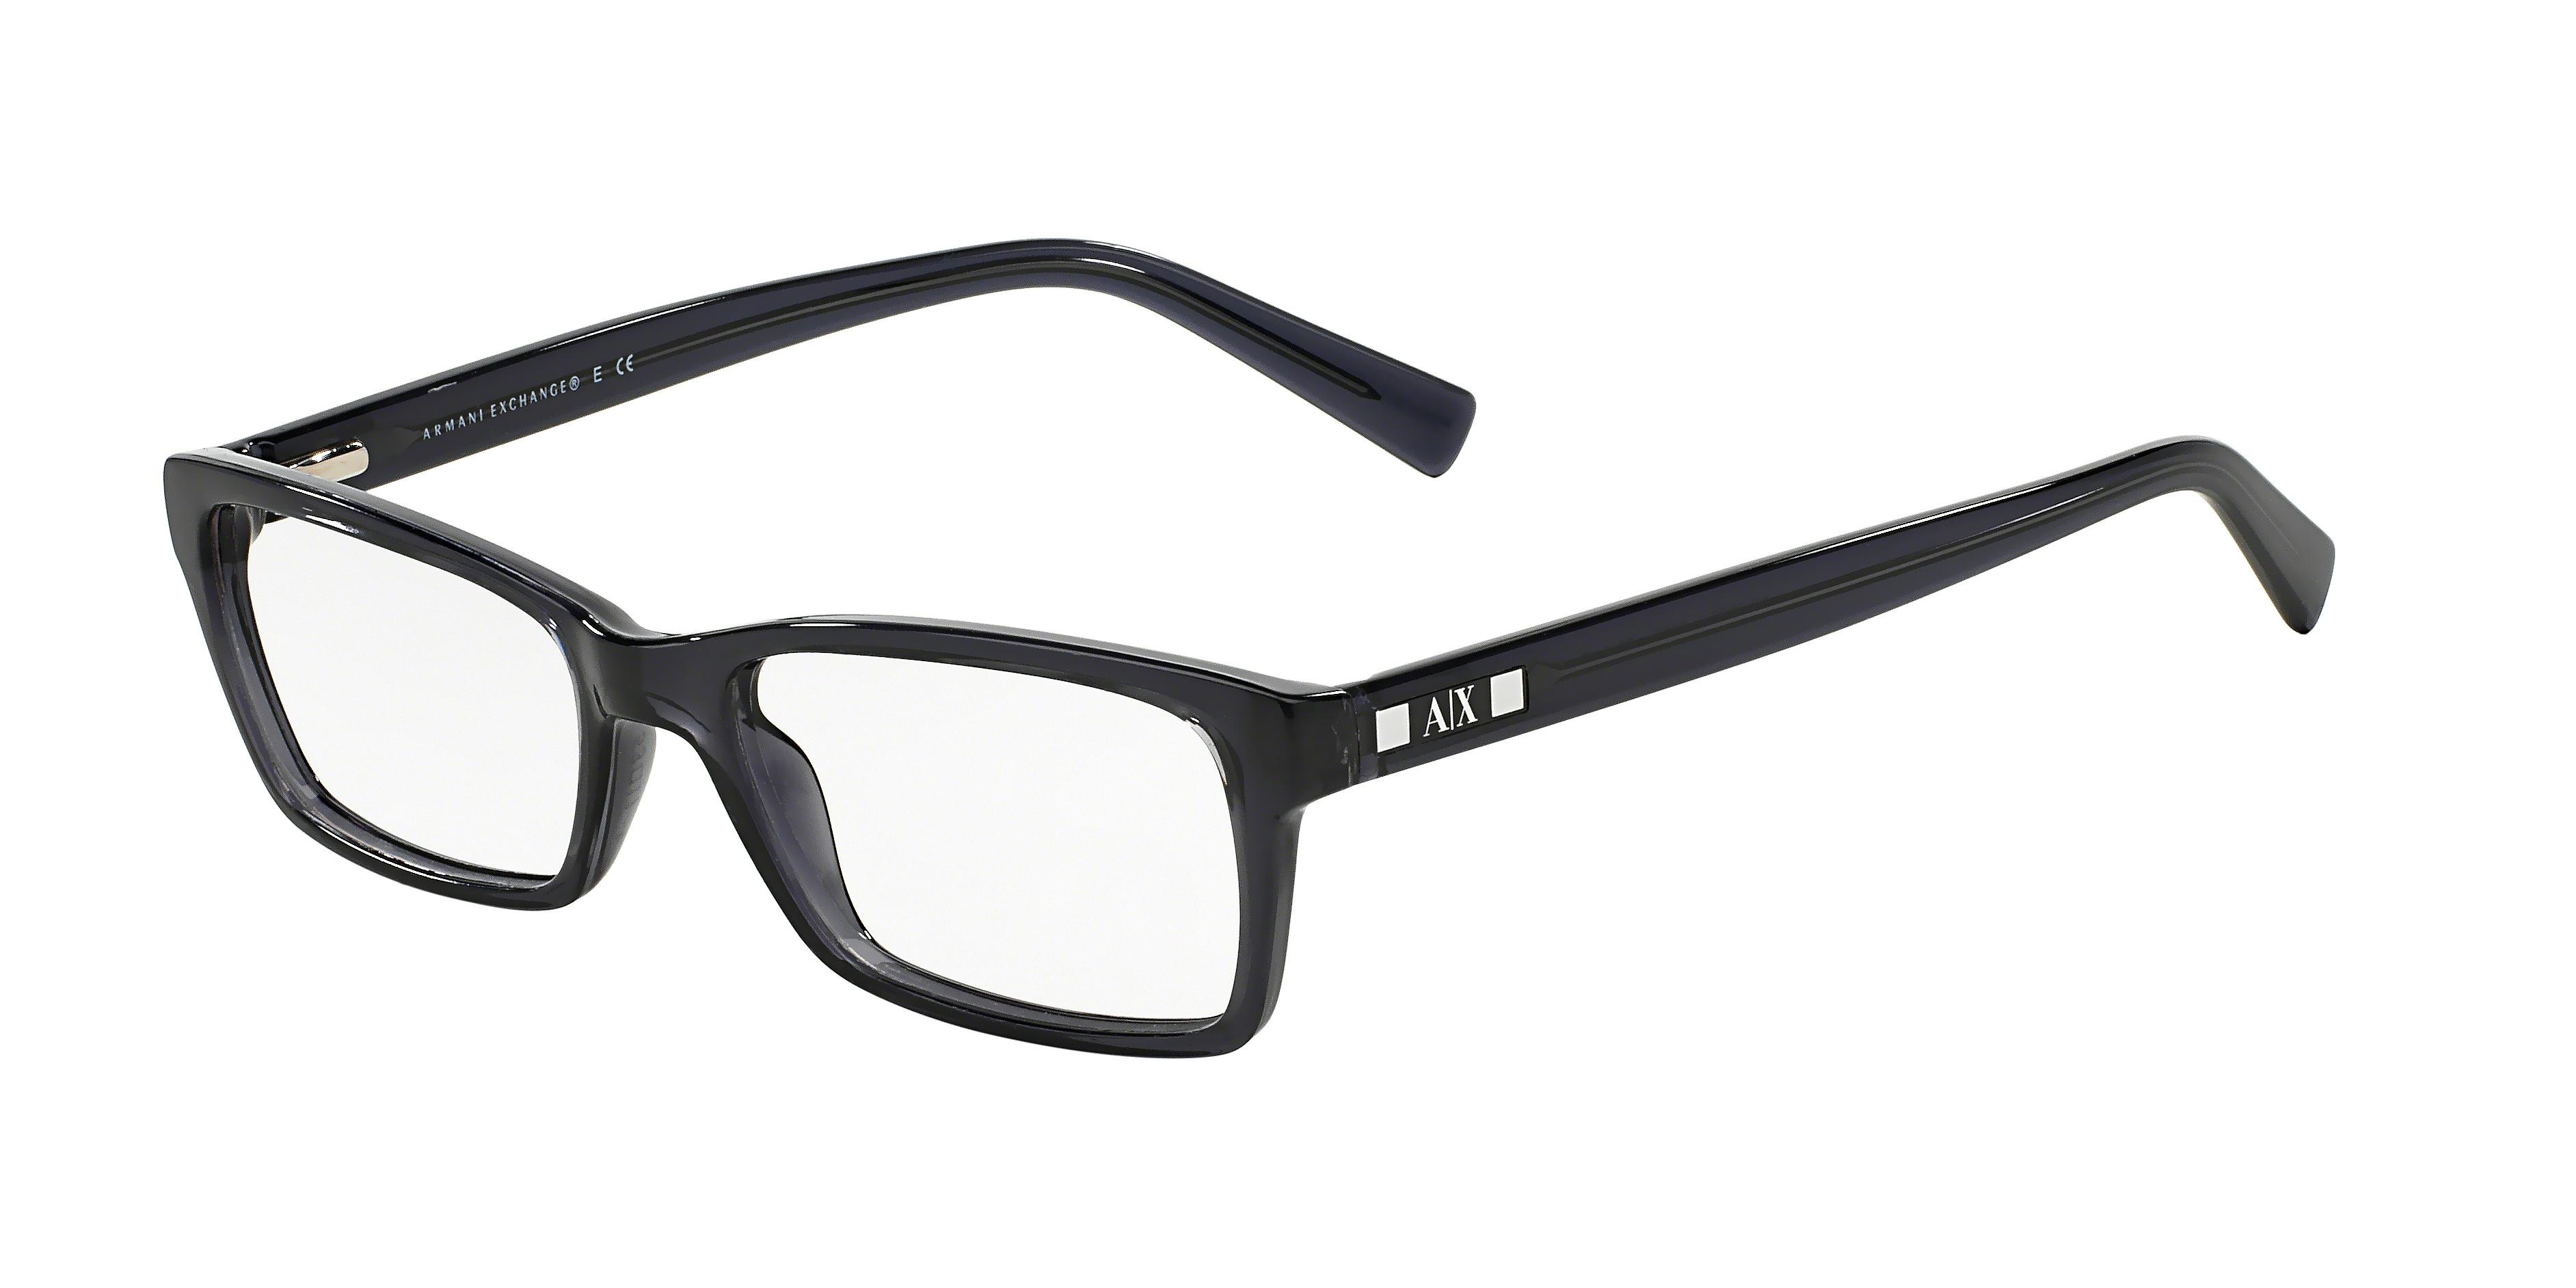 7fe35771754 Armani Exchange AX3007 Progressive Prescription Eyeglasses FREE S H  AX3007-8005-53-PRO